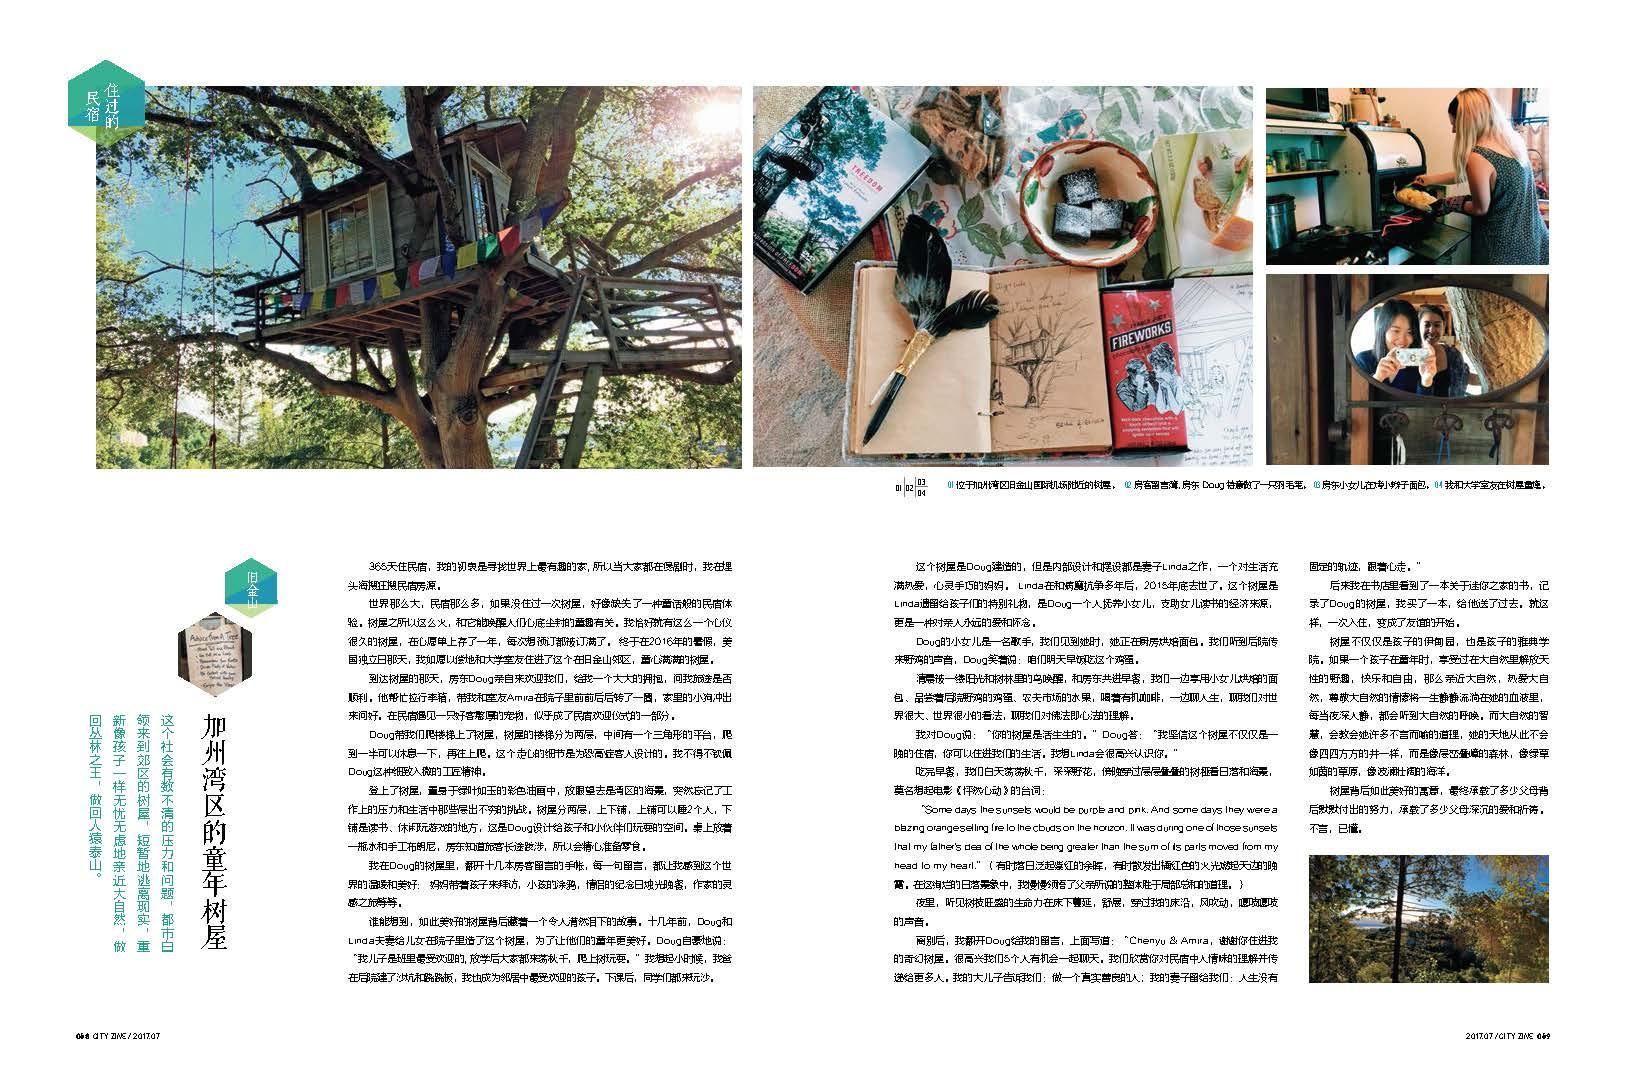 P64-83苹果02 CITYZINE final_Page_03.jpg